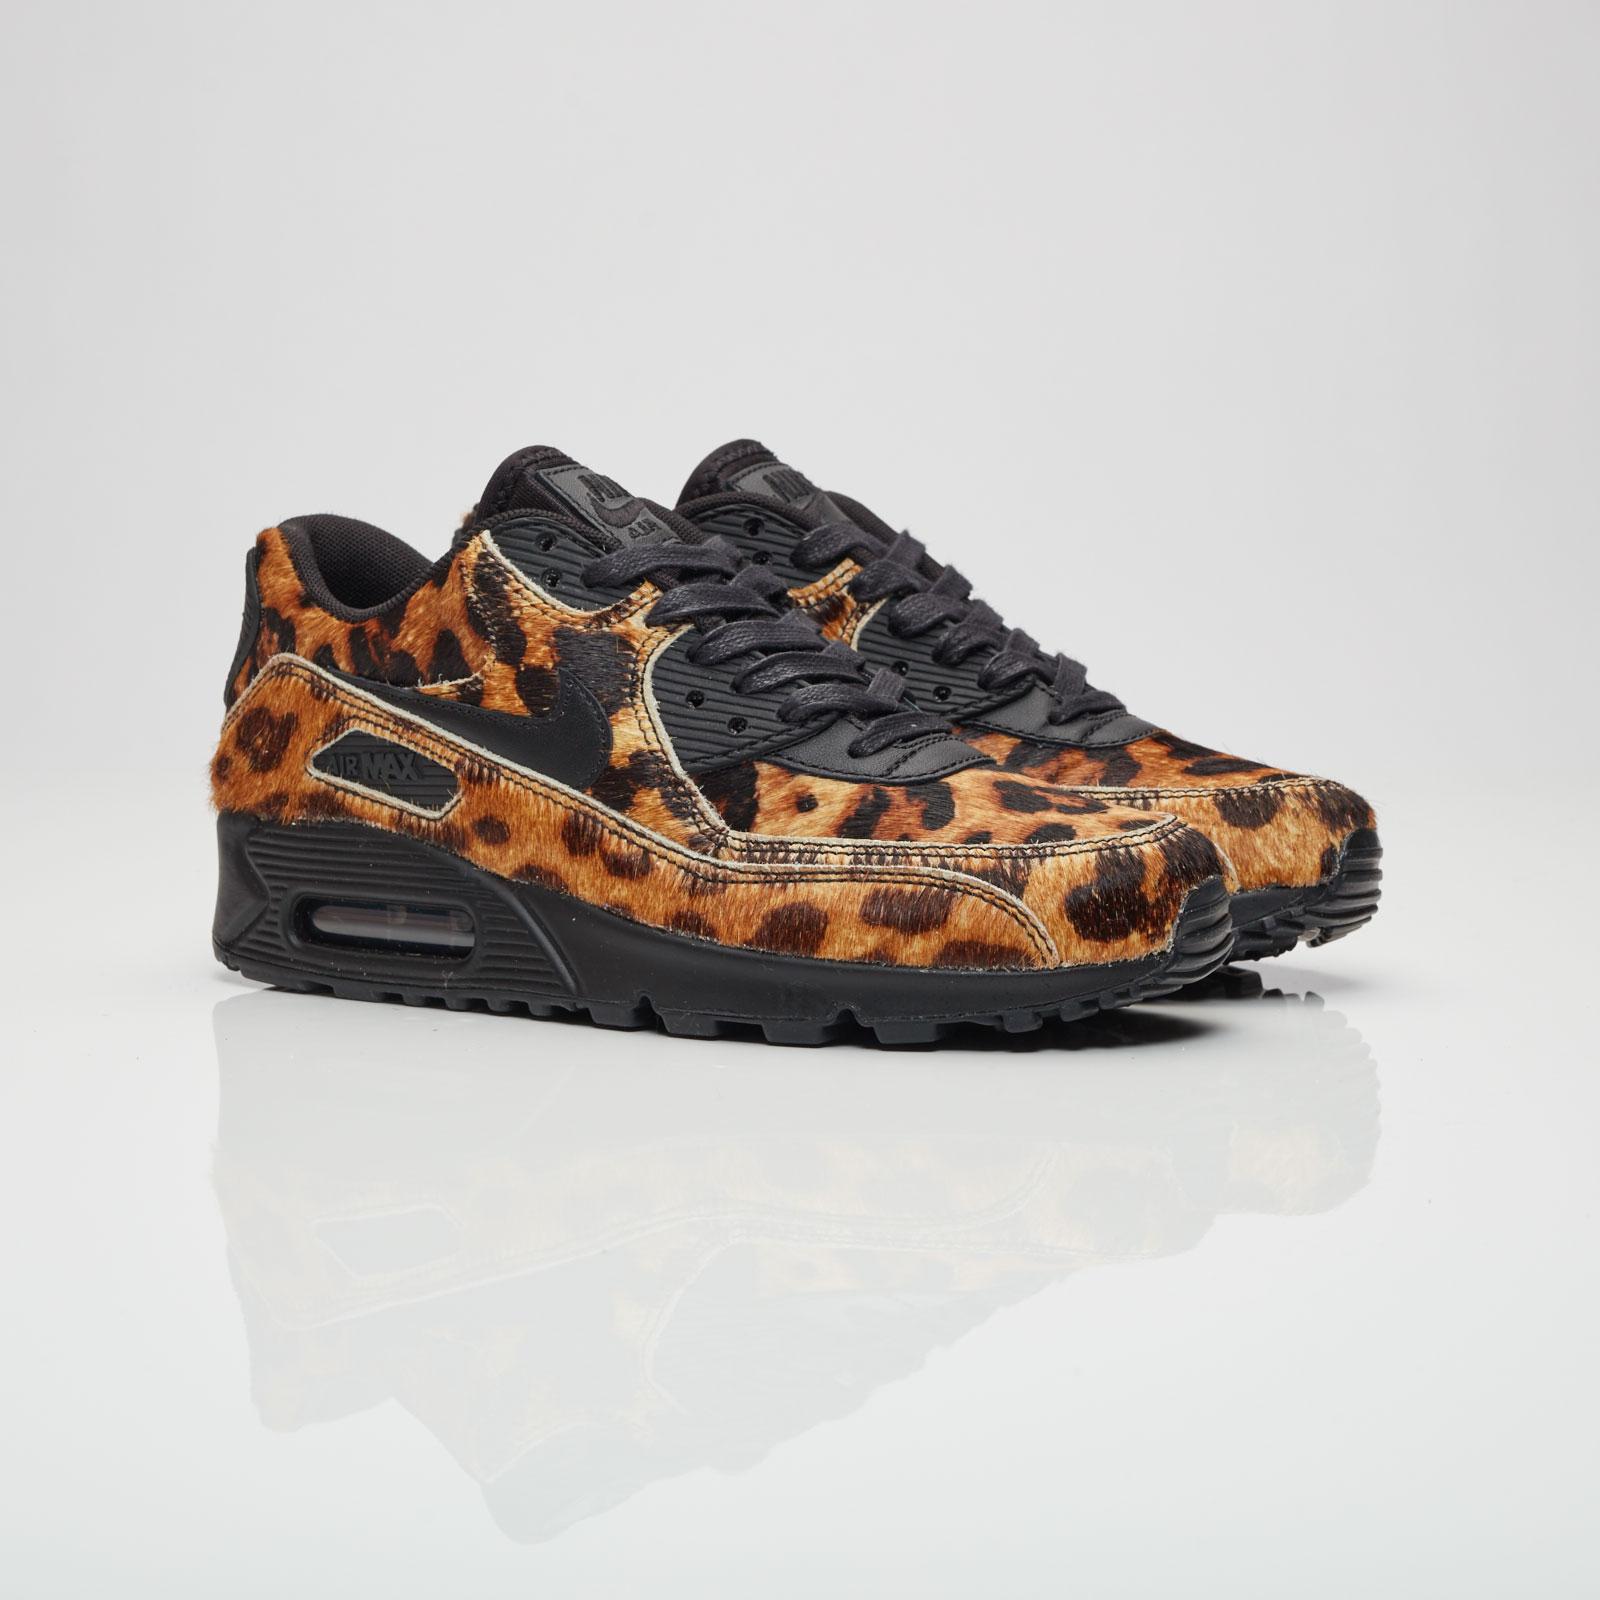 Nike Wmns Air Max 90 Lx - 898512-002 - Sneakersnstuff  d669bcb66